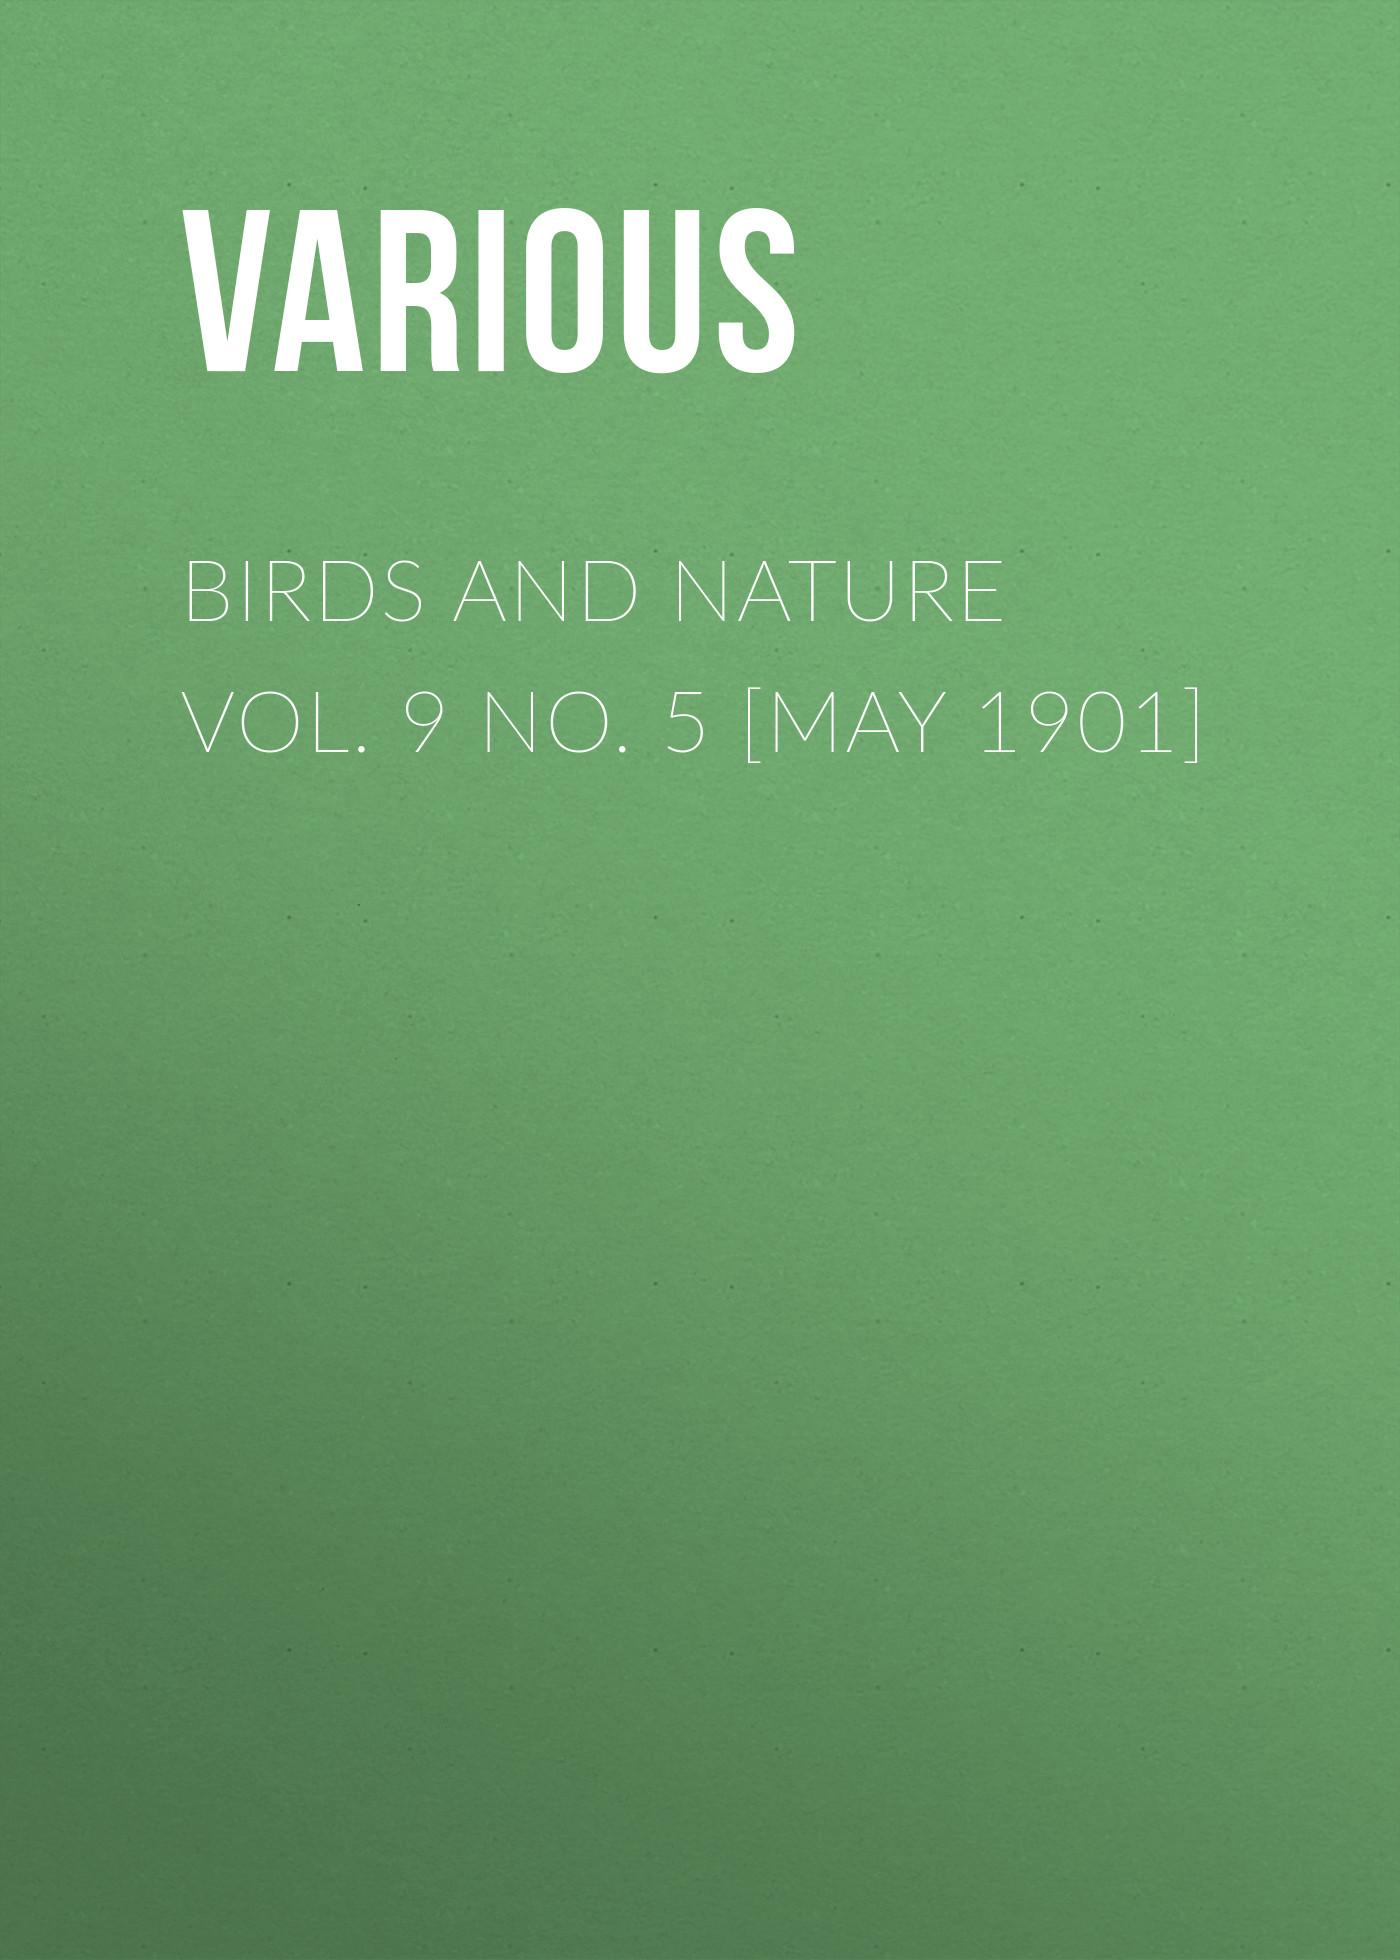 Various Birds and Nature Vol. 9 No. 5 [May 1901] new lone wolf and cub vol 5